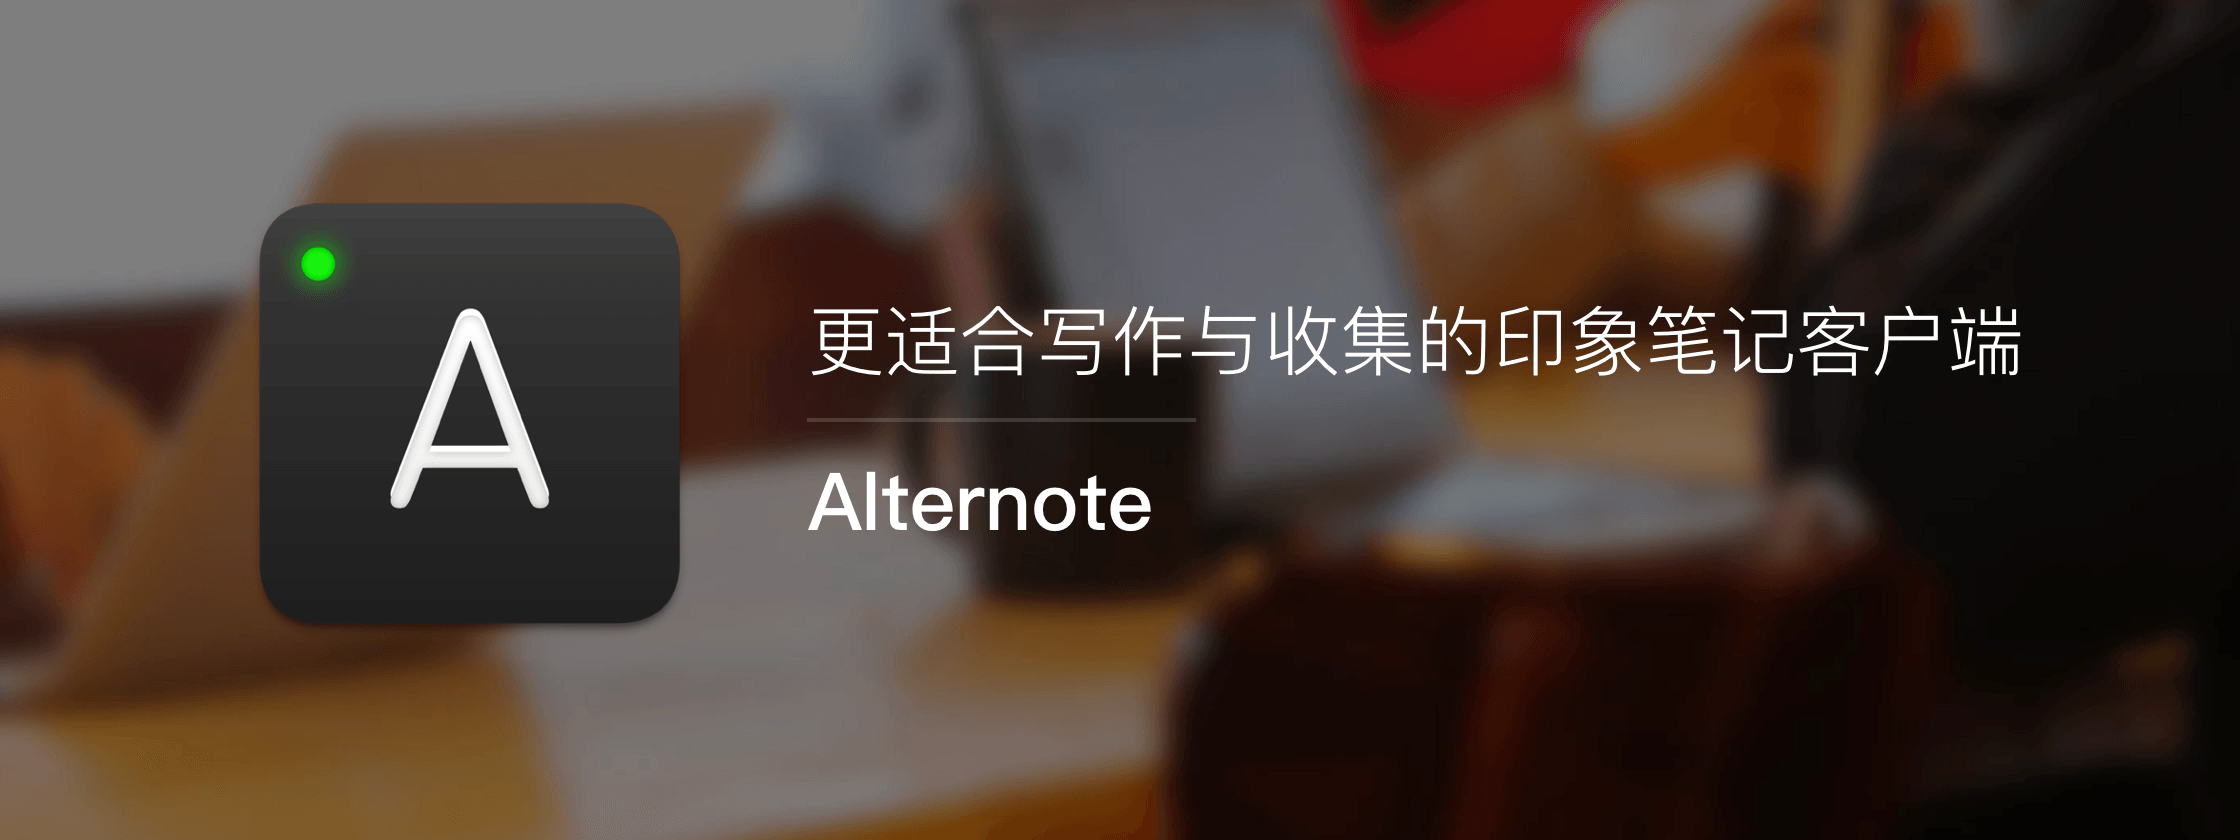 Alternote – 更适合写作与收集的「印象笔记 Evernote」客户端